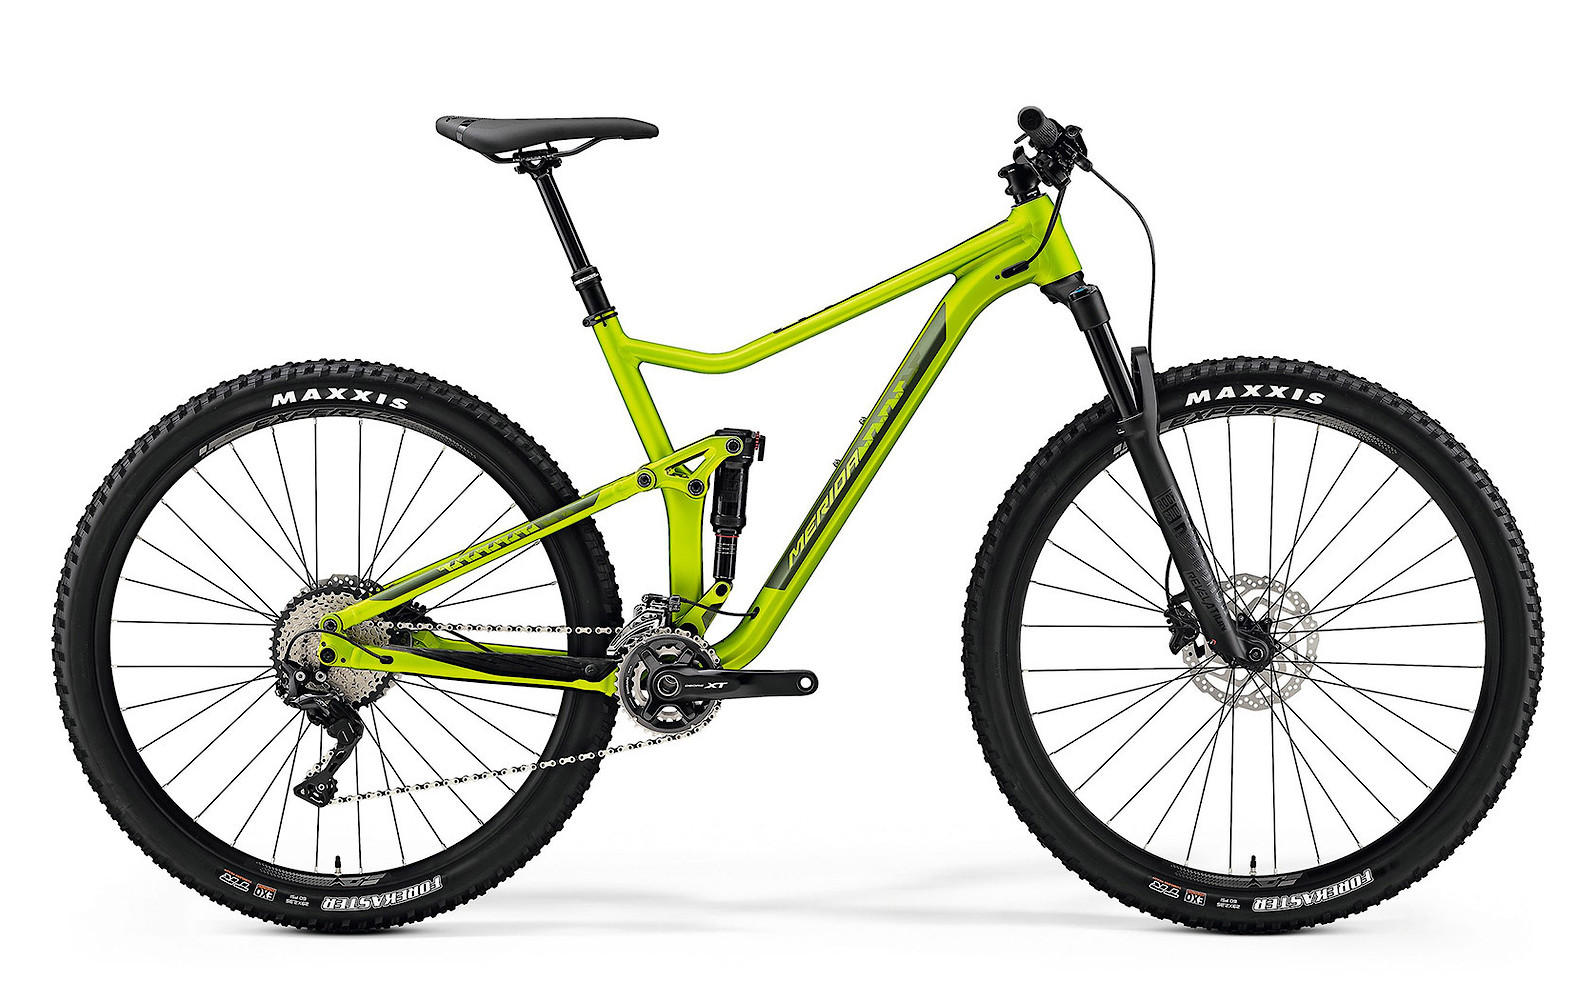 2019 Merida One-Twenty XT Edition Bike